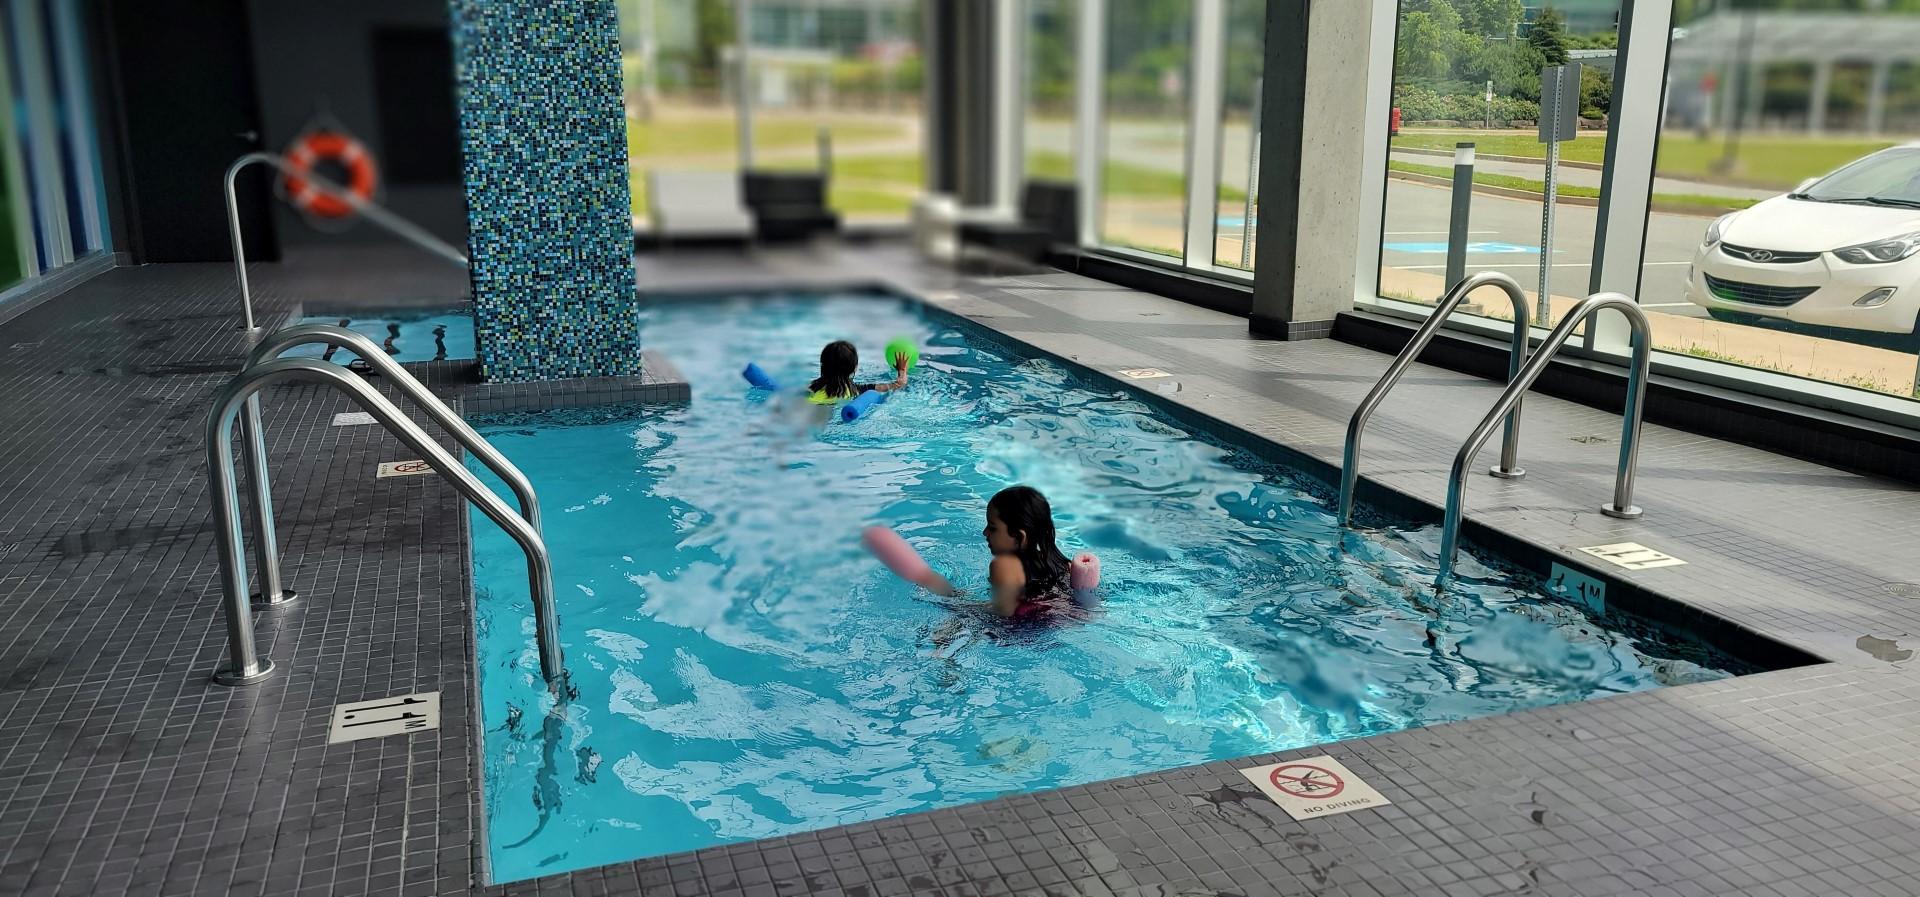 swimming pool at Halifax airport hotel